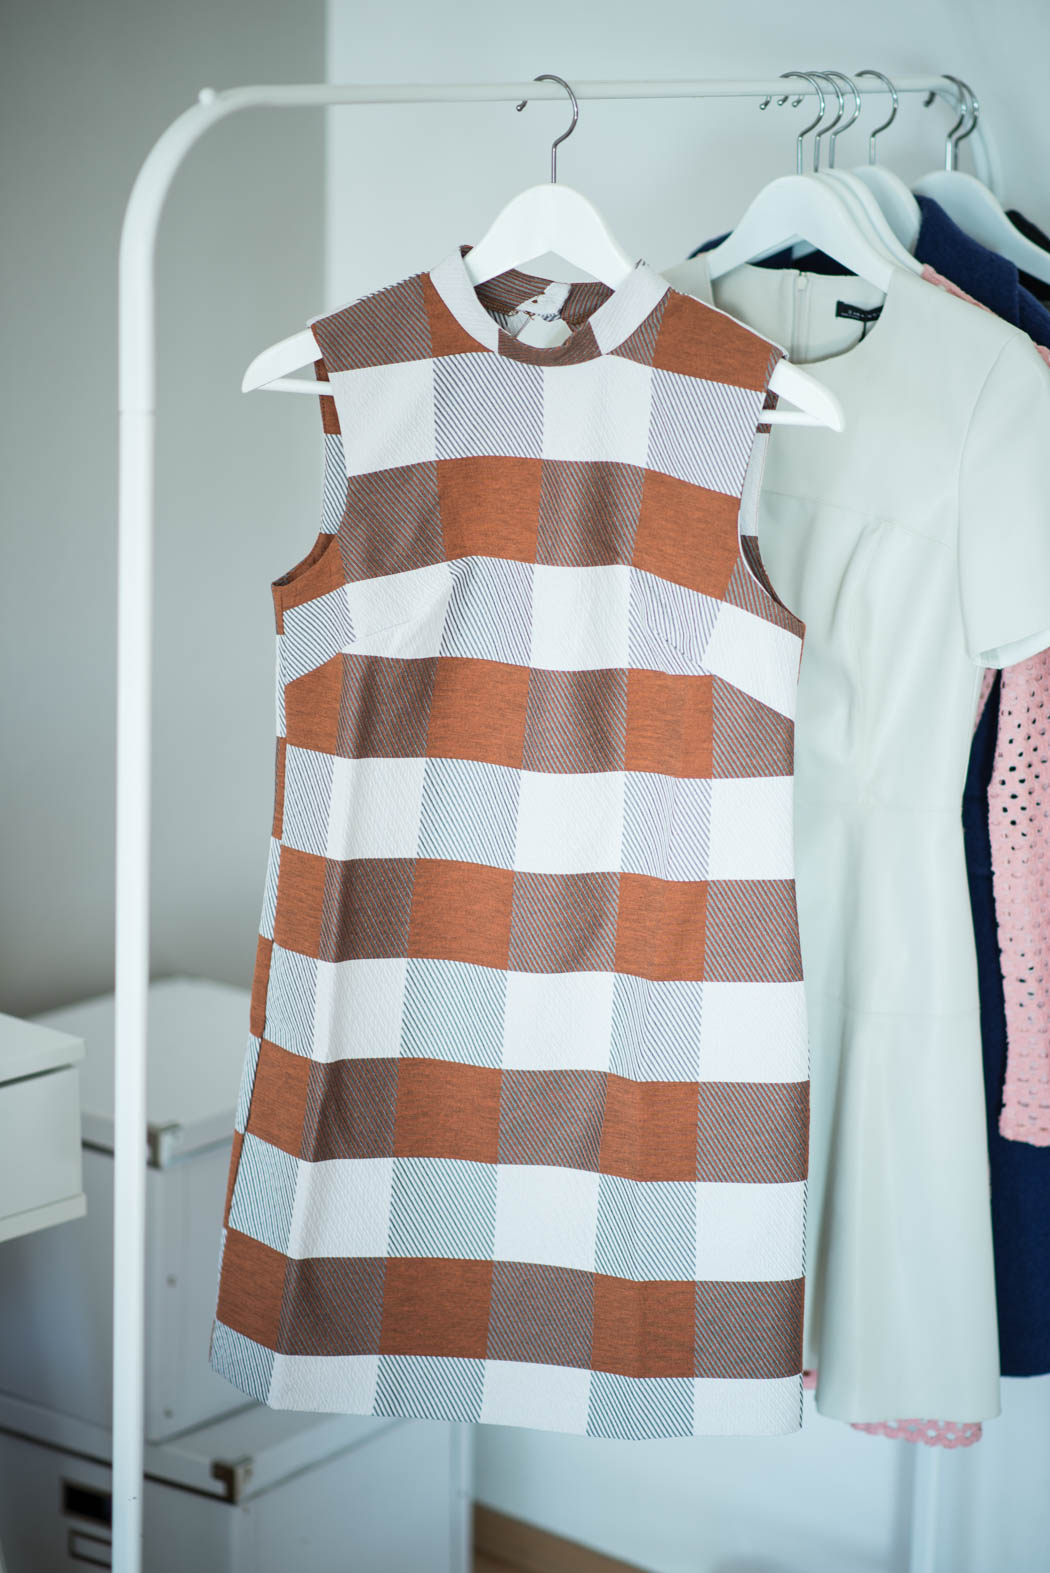 Shoppinghaul-Lindarella-Fashionblogger-München-Deutschland-Fashionblog-6